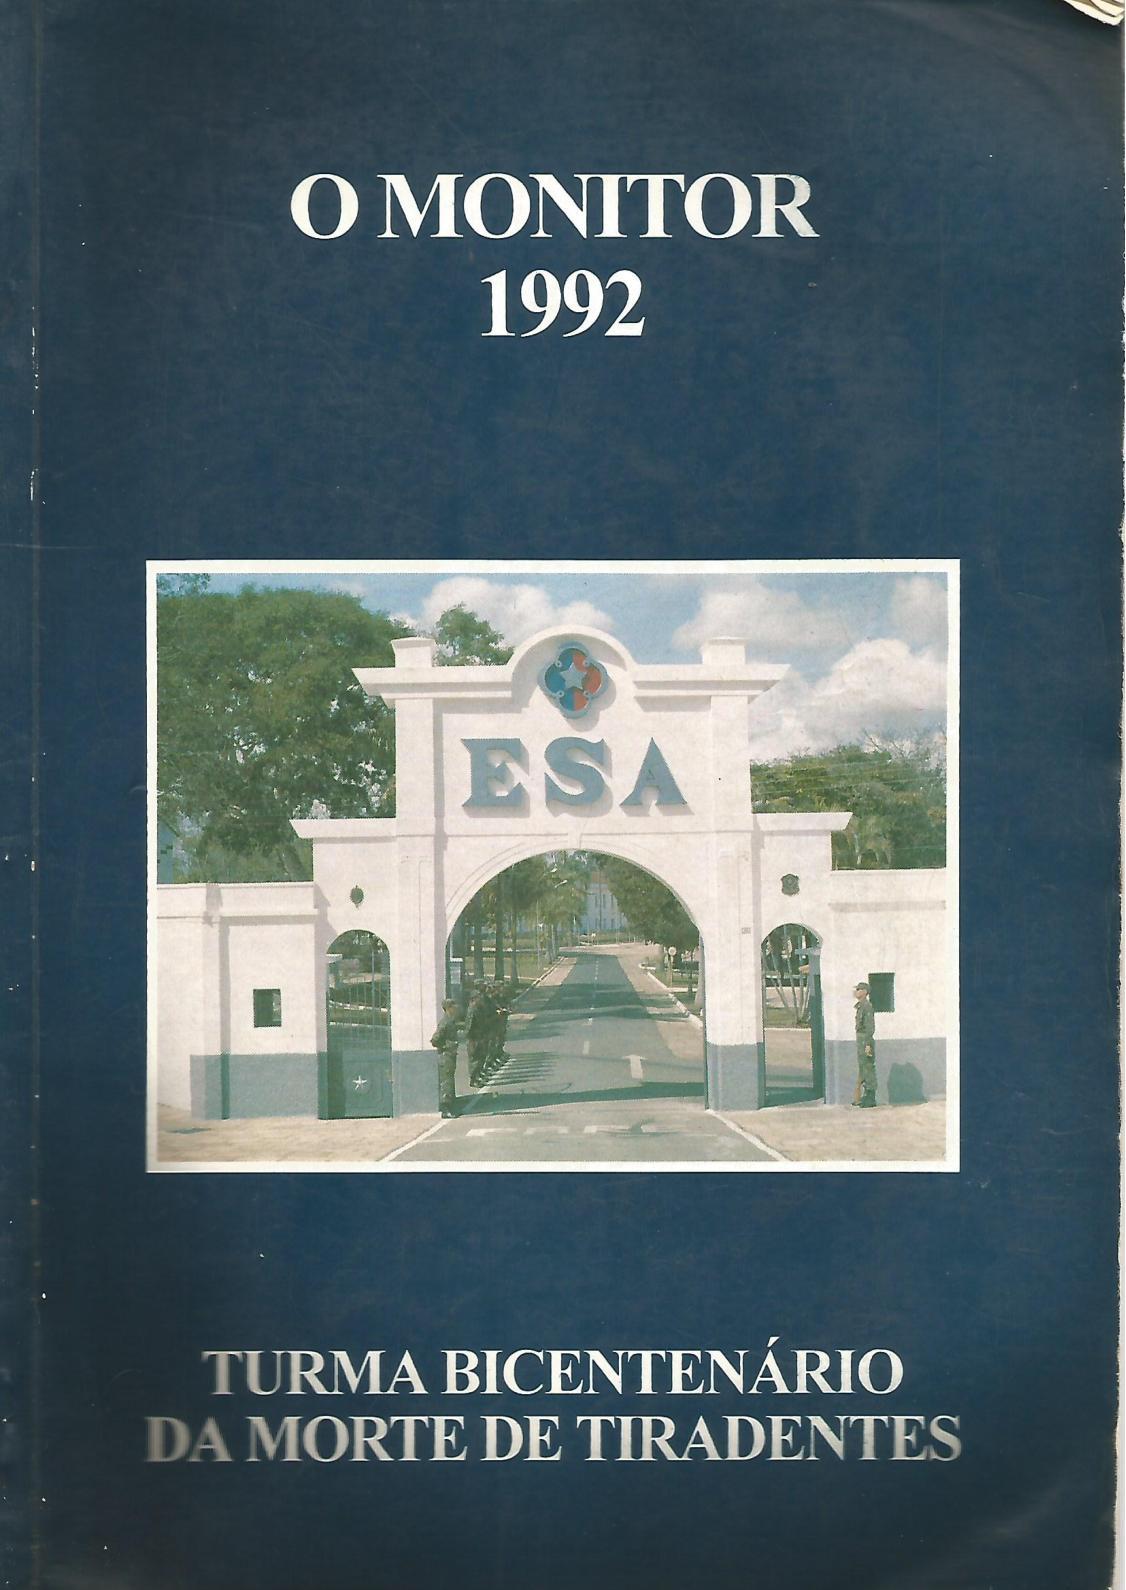 O Monitor 1992